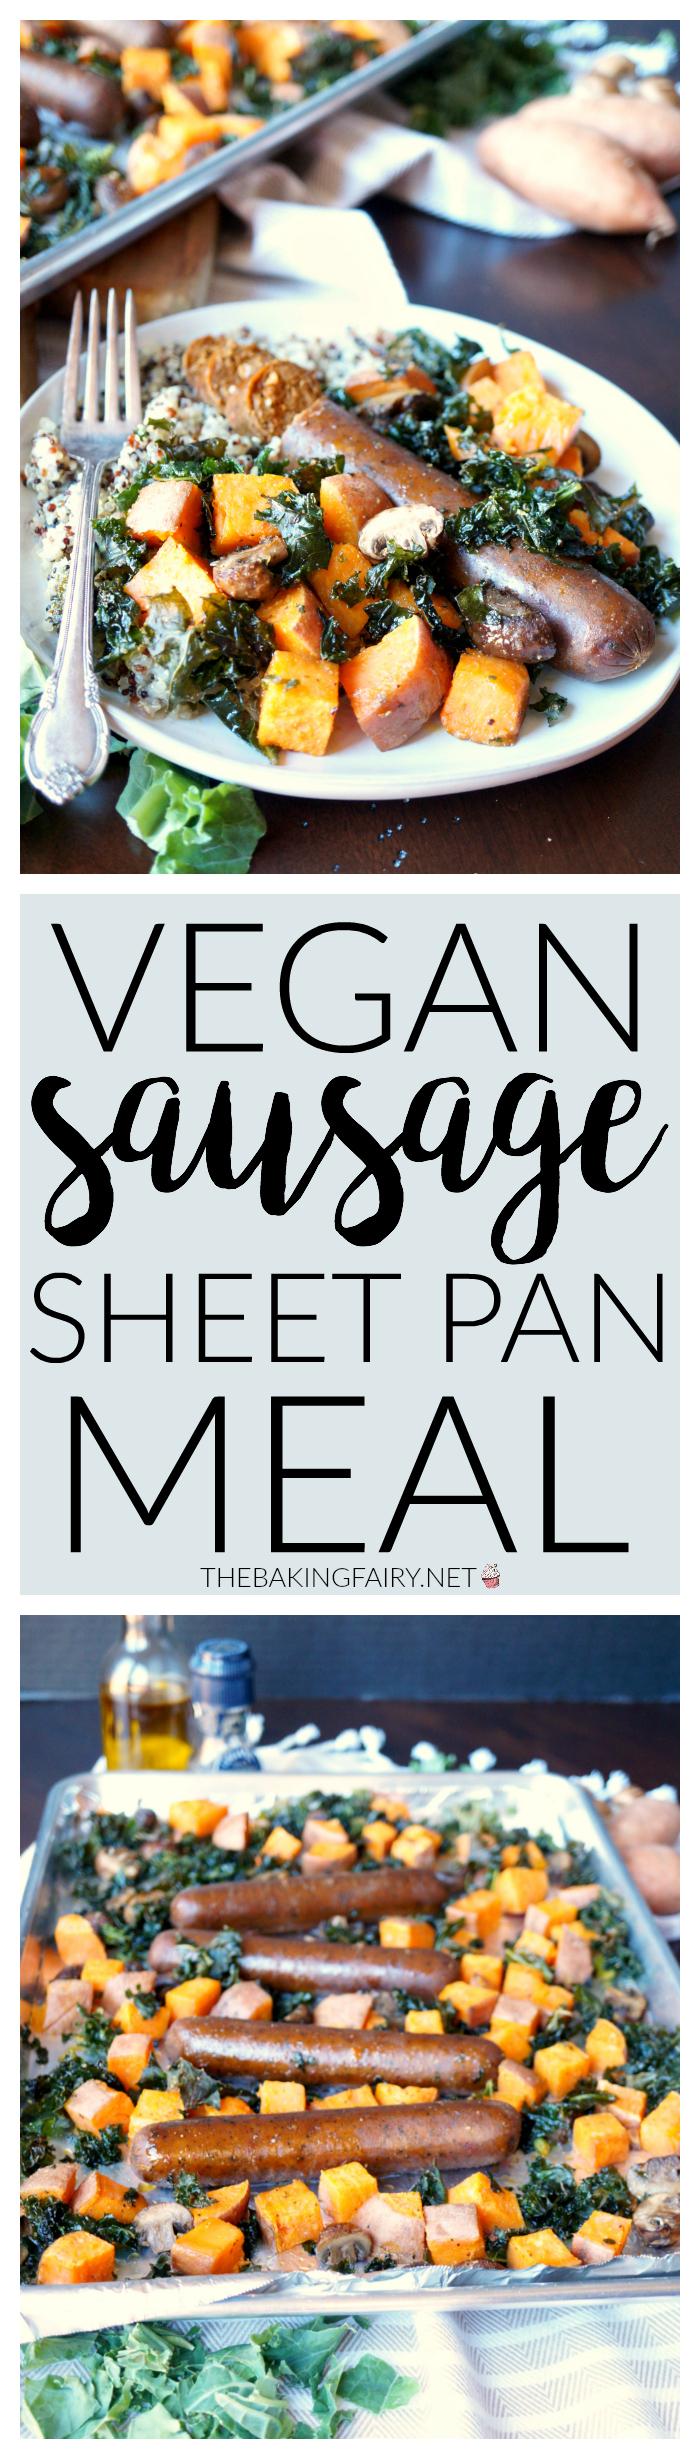 vegan sausage sheet pan meal with sweet potatoes and kale   The Baking Fairy